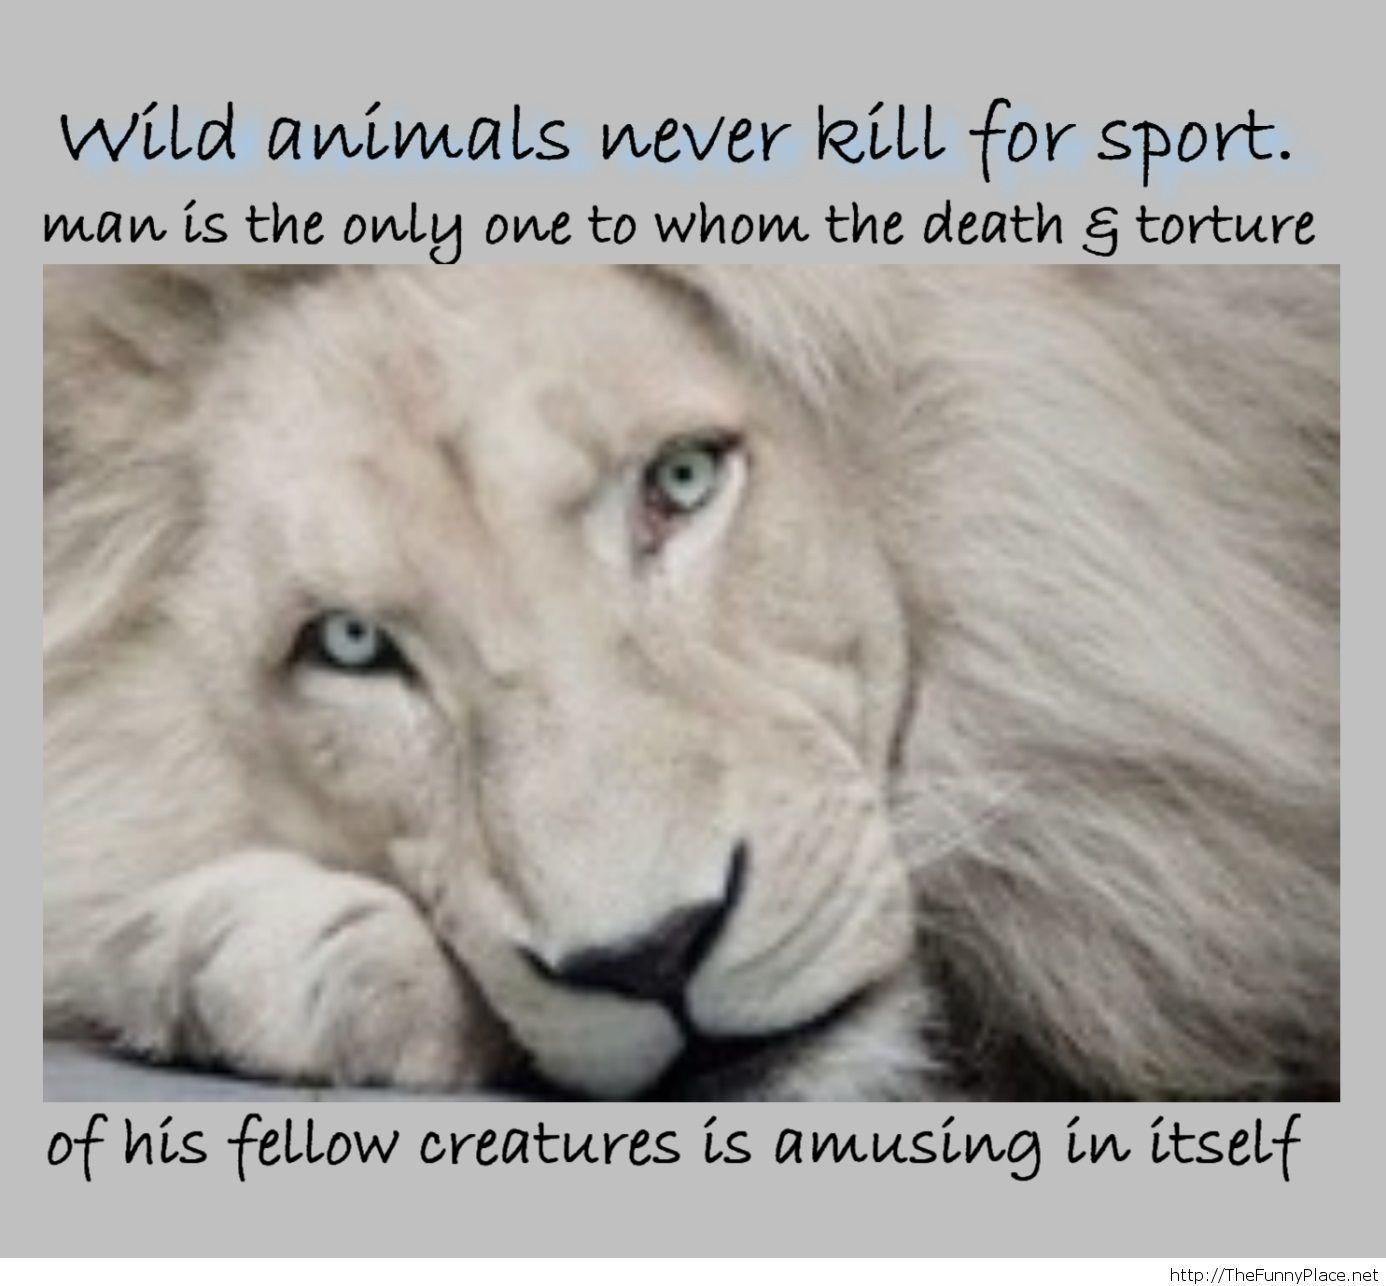 Wild animals never kill for sport